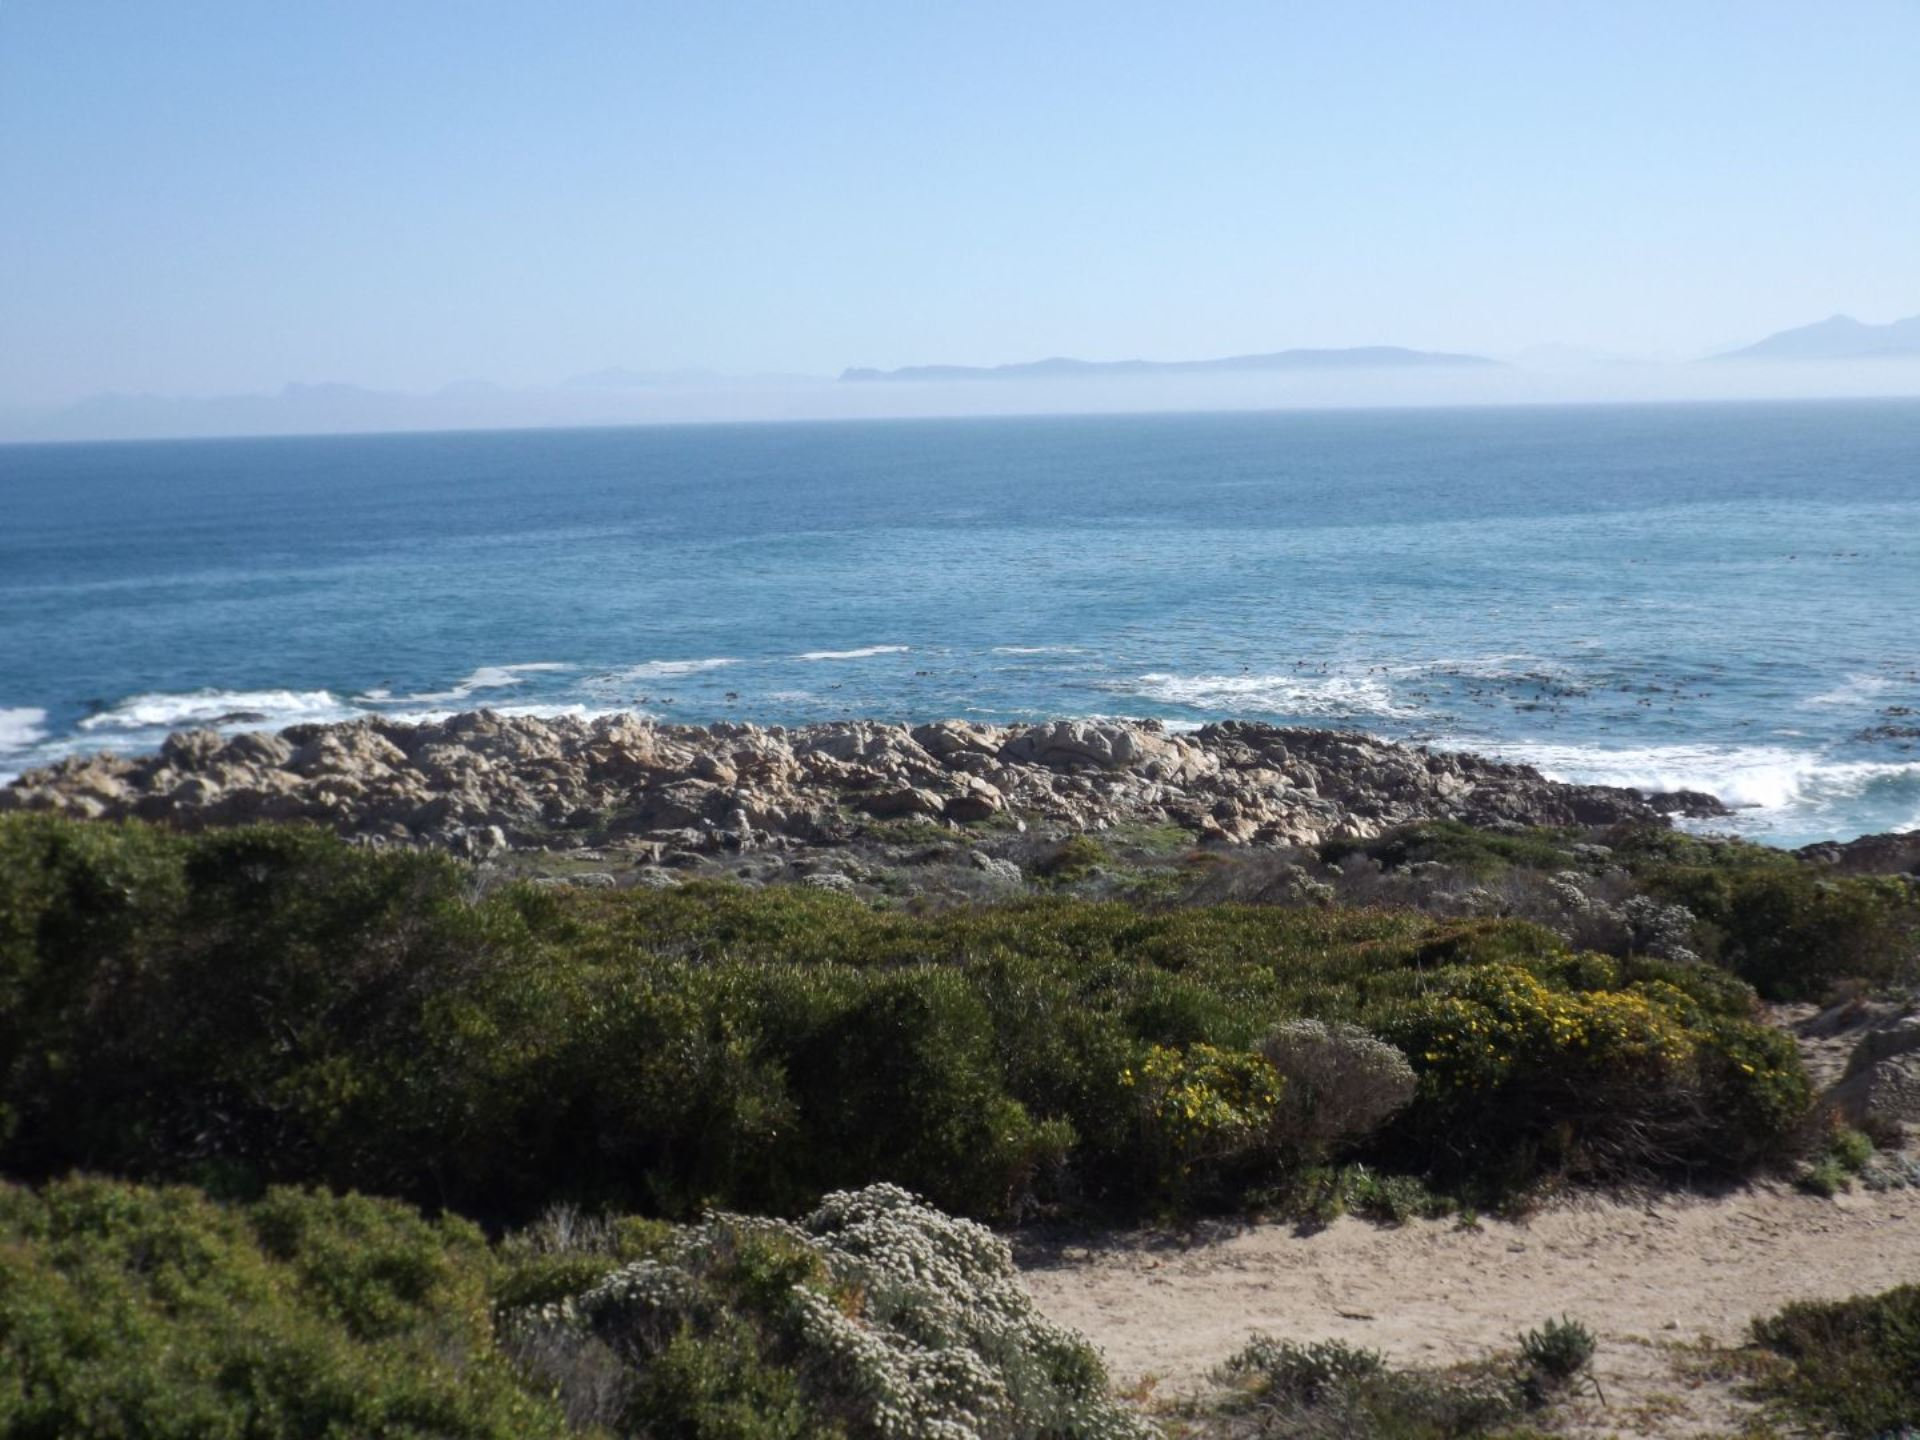 Sea View to the front; Hermanus, Hangklip & Bettys Bay at back.